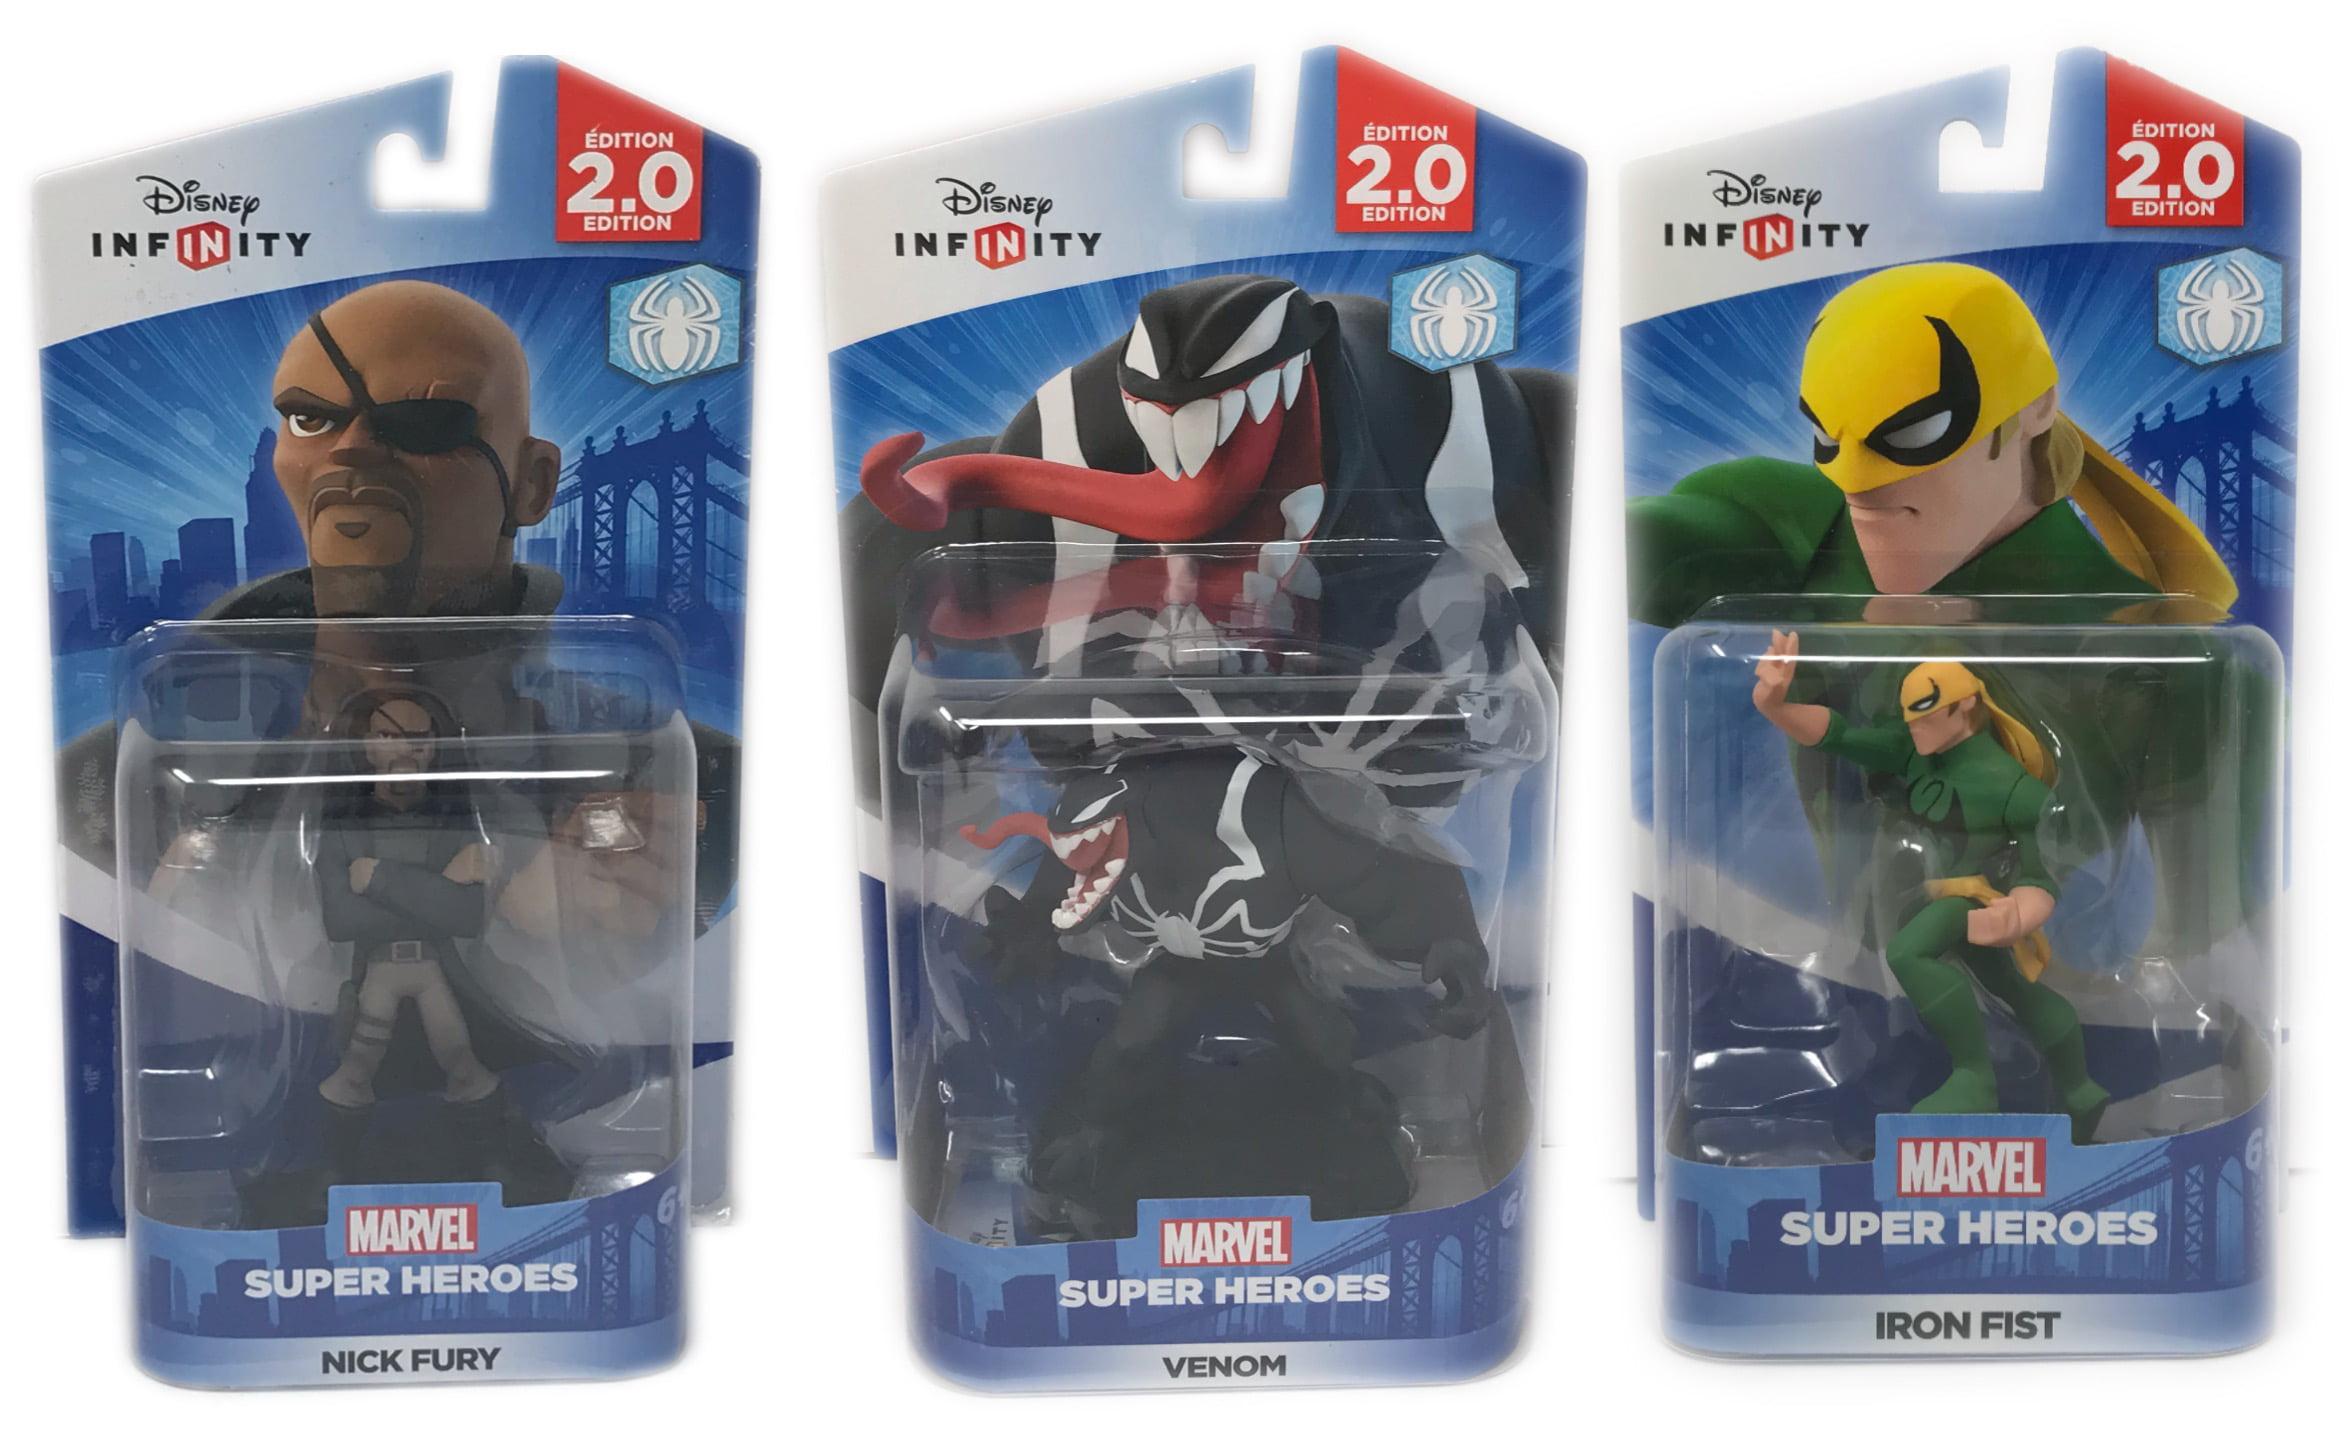 Disney Infinity 2.0 Marvel Super Heroes Venom, Nick Fury, Iron Fist Brand New! by